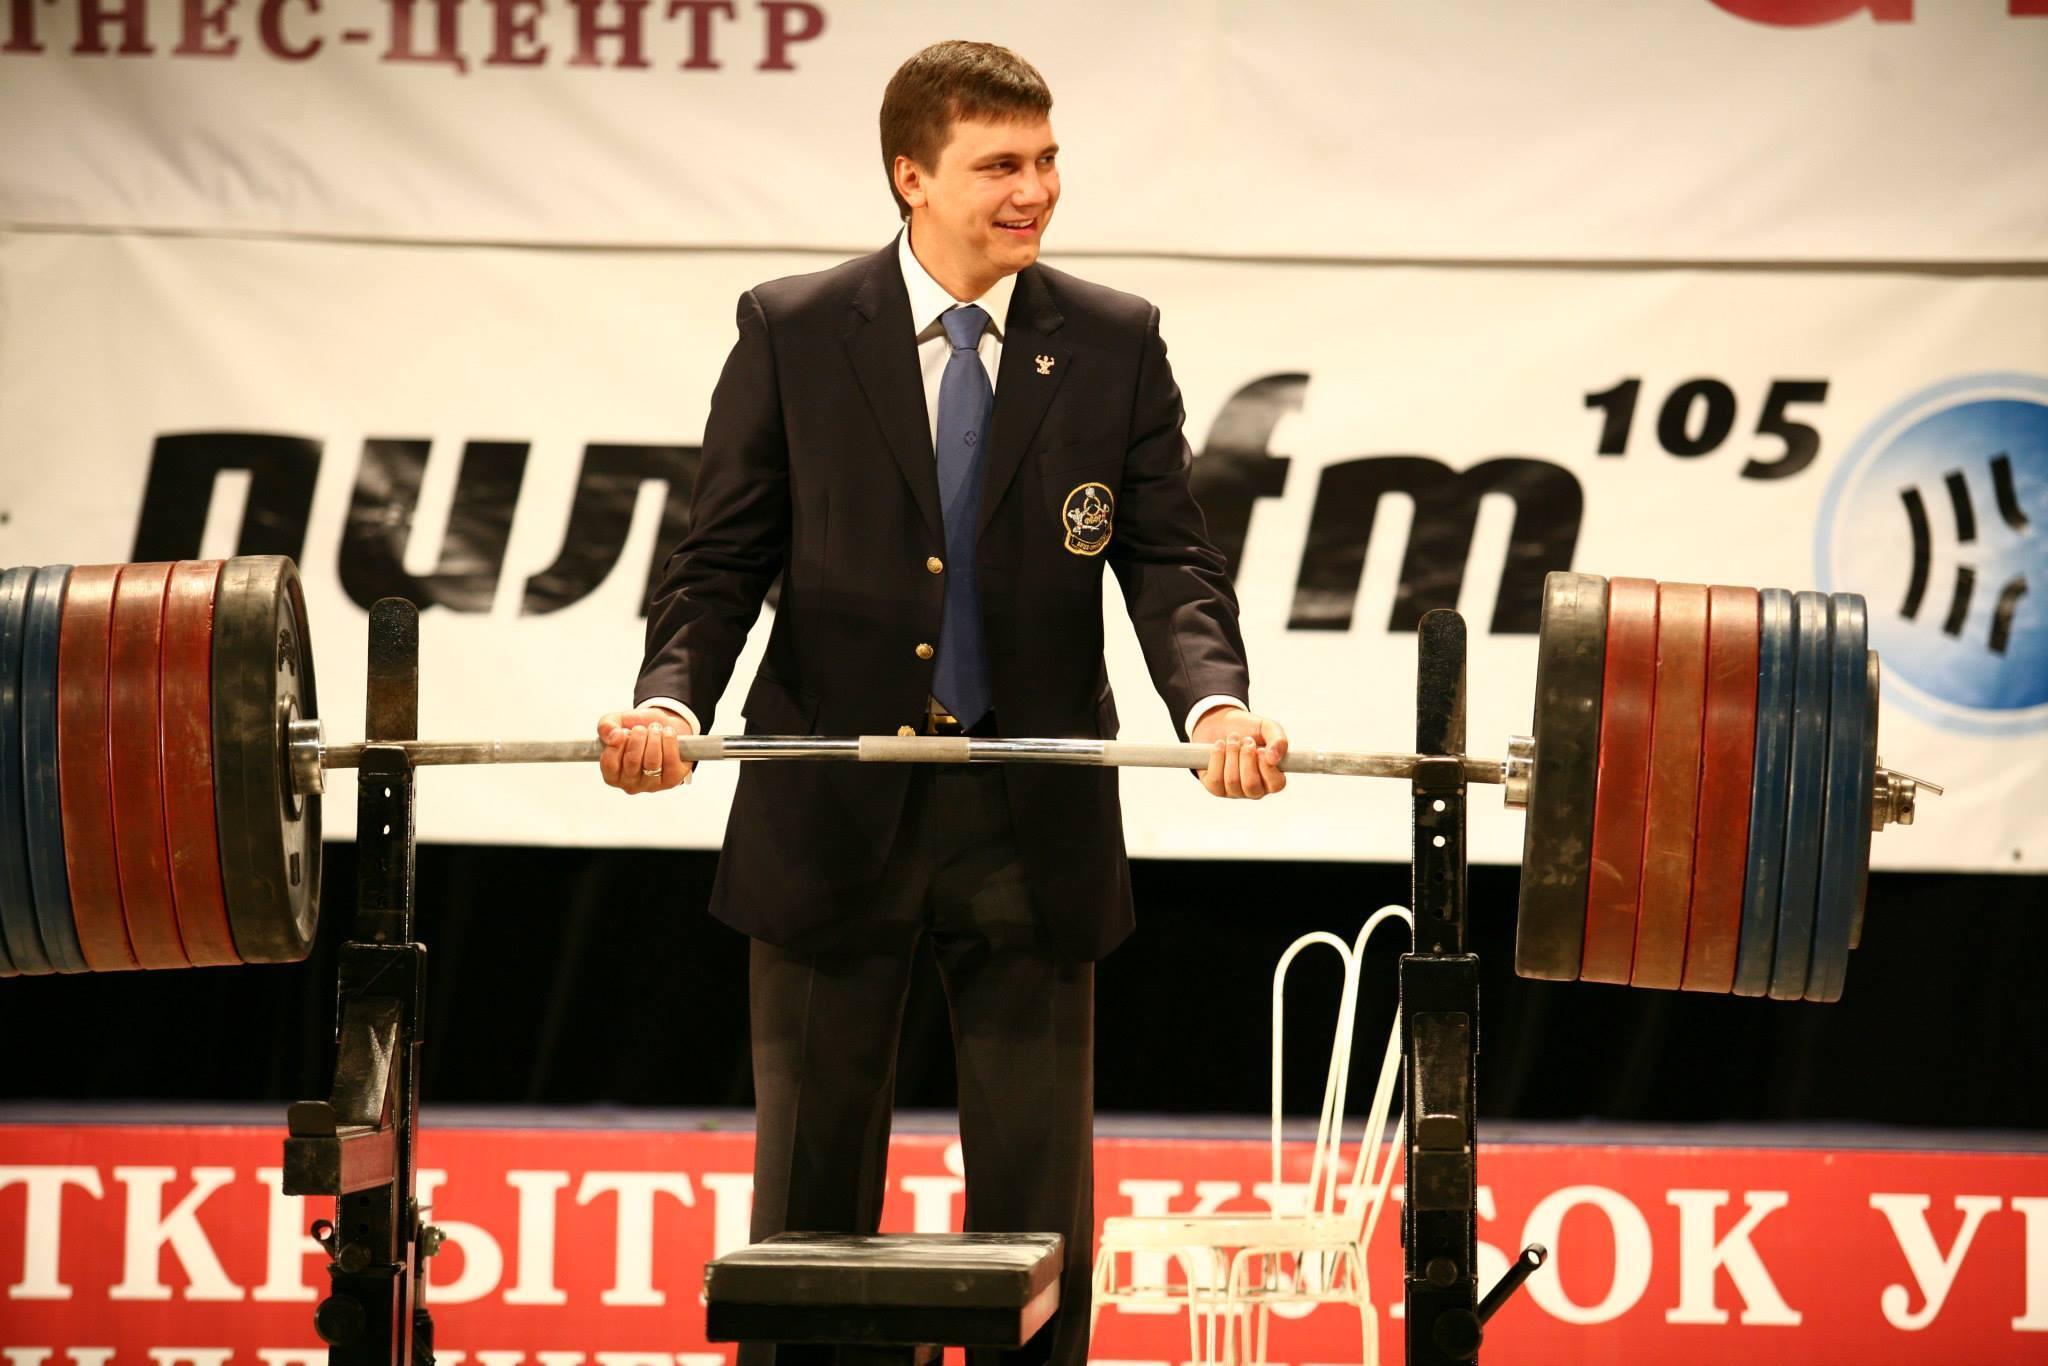 Антон Гиренко-Коцуба - президент федерации бодибилдинга и фитнеса России по УрФО, вице-президент ФБФР